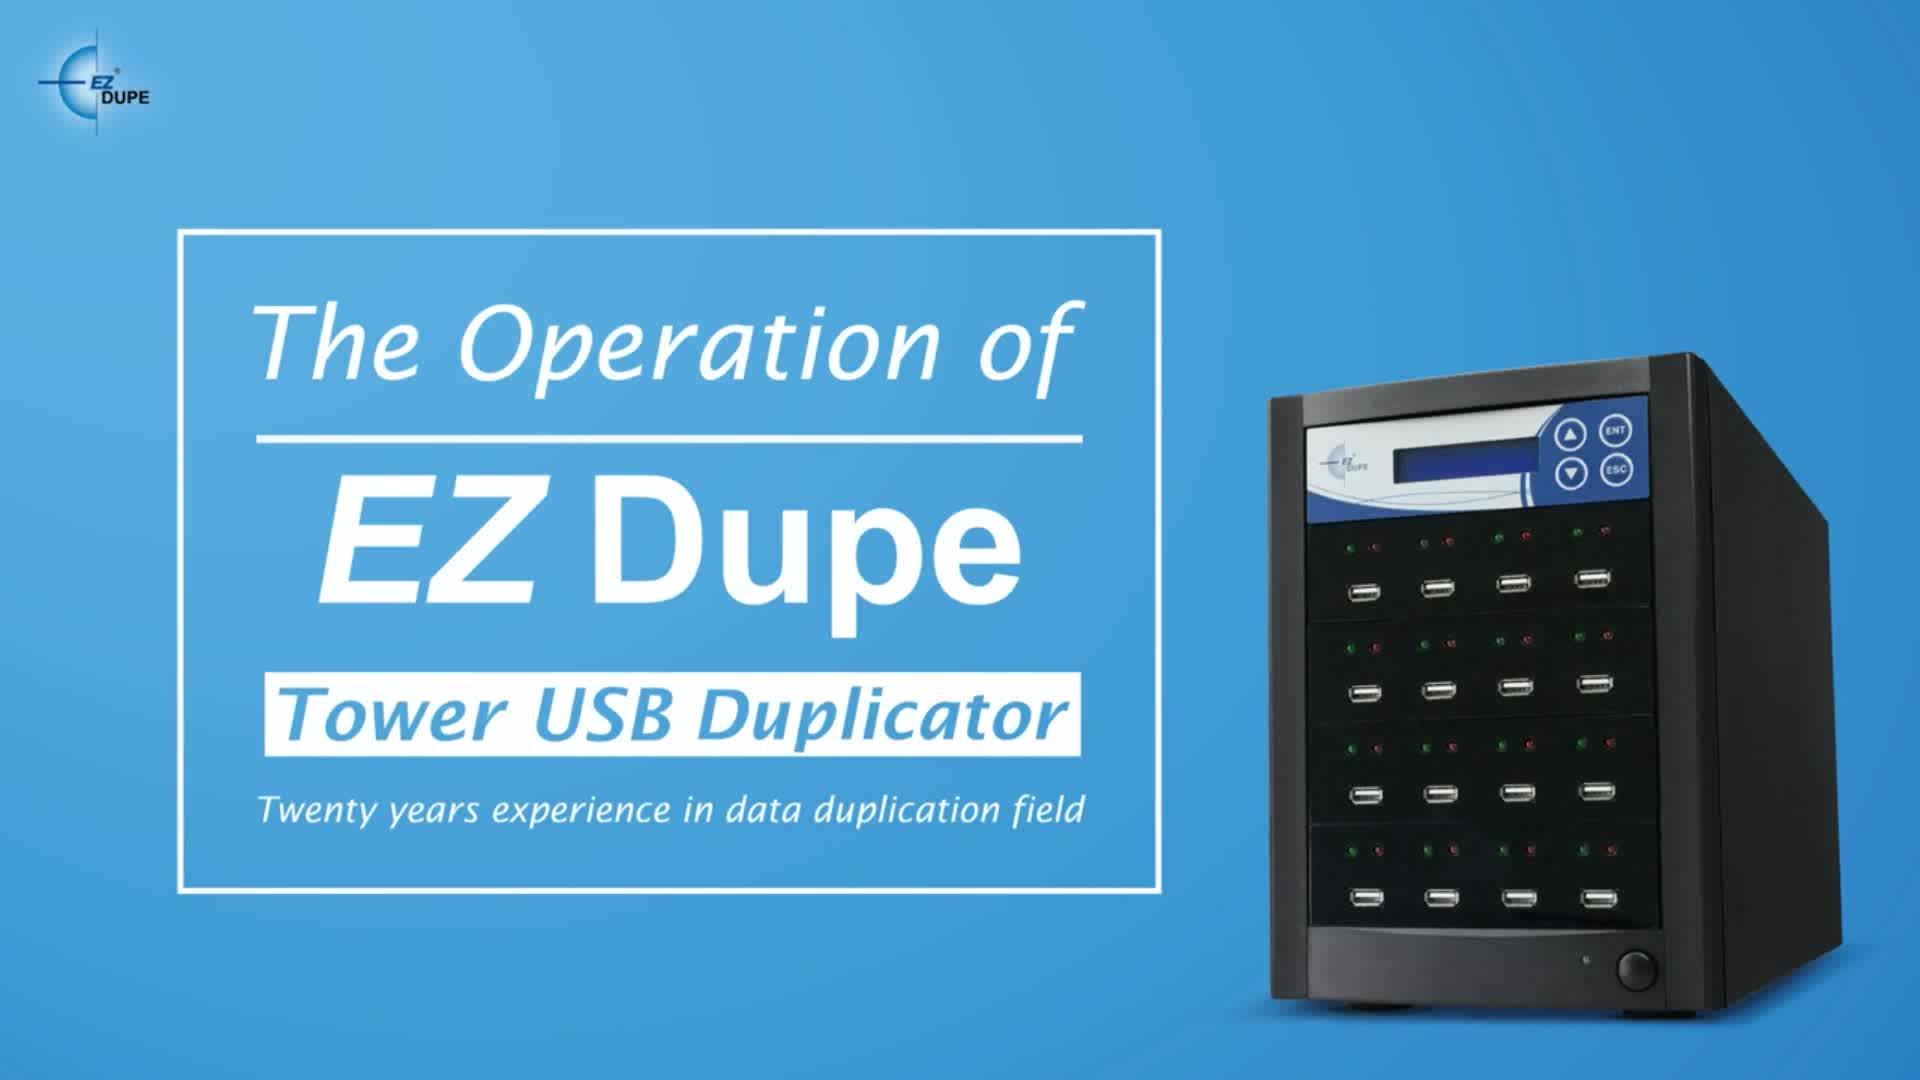 EZ Dupe Xtreme 1 to 63 targets Industrial USB 3.0 Duplicator / Copier